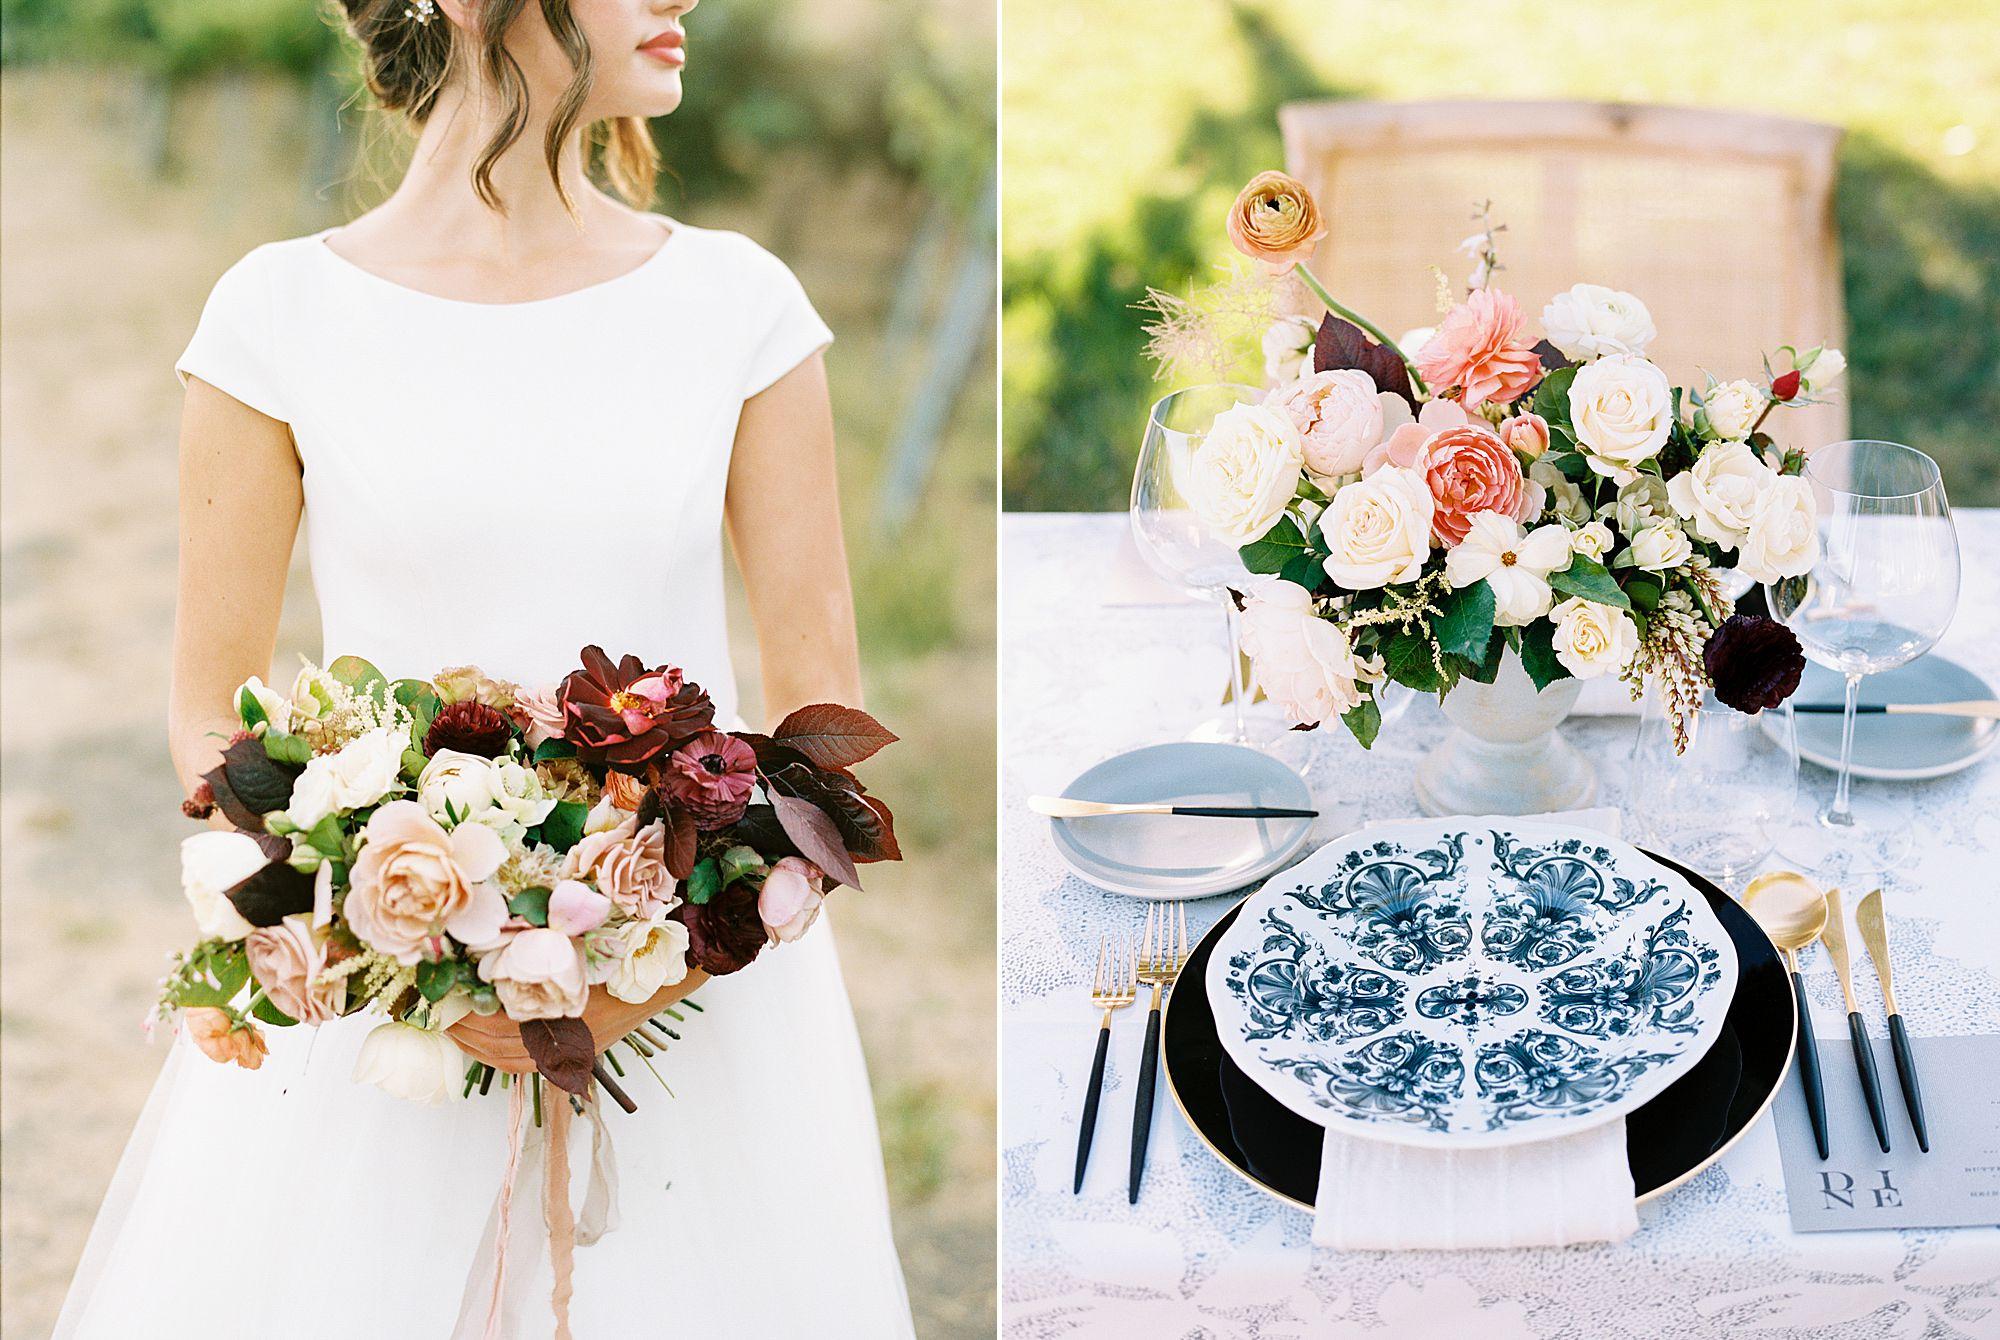 HammerSky Wedding Inspiration Featured on Hey Wedding Lady with Vanessa Noel Events - Ashley Baumgartner - SLO Wedding Photographer_0001.jpg